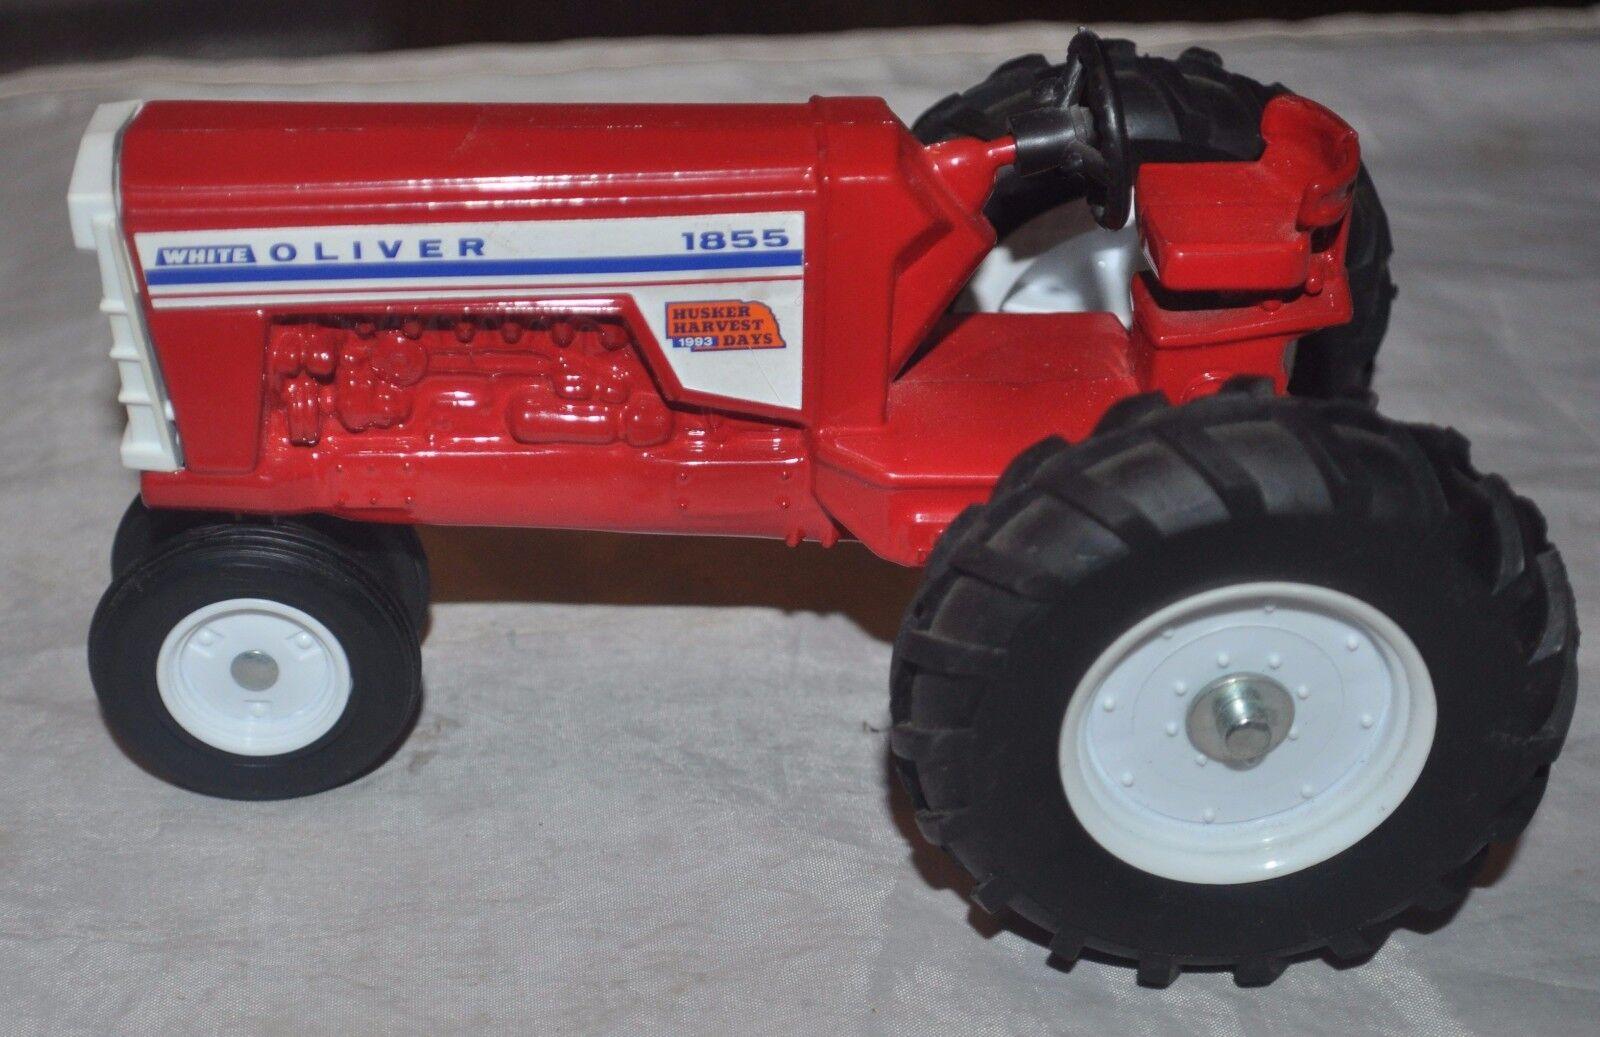 1   32 tractor blanco Oliver 1855 (A escala), modelo  Día de la cosecha de cásCocheas de arroz, 1993